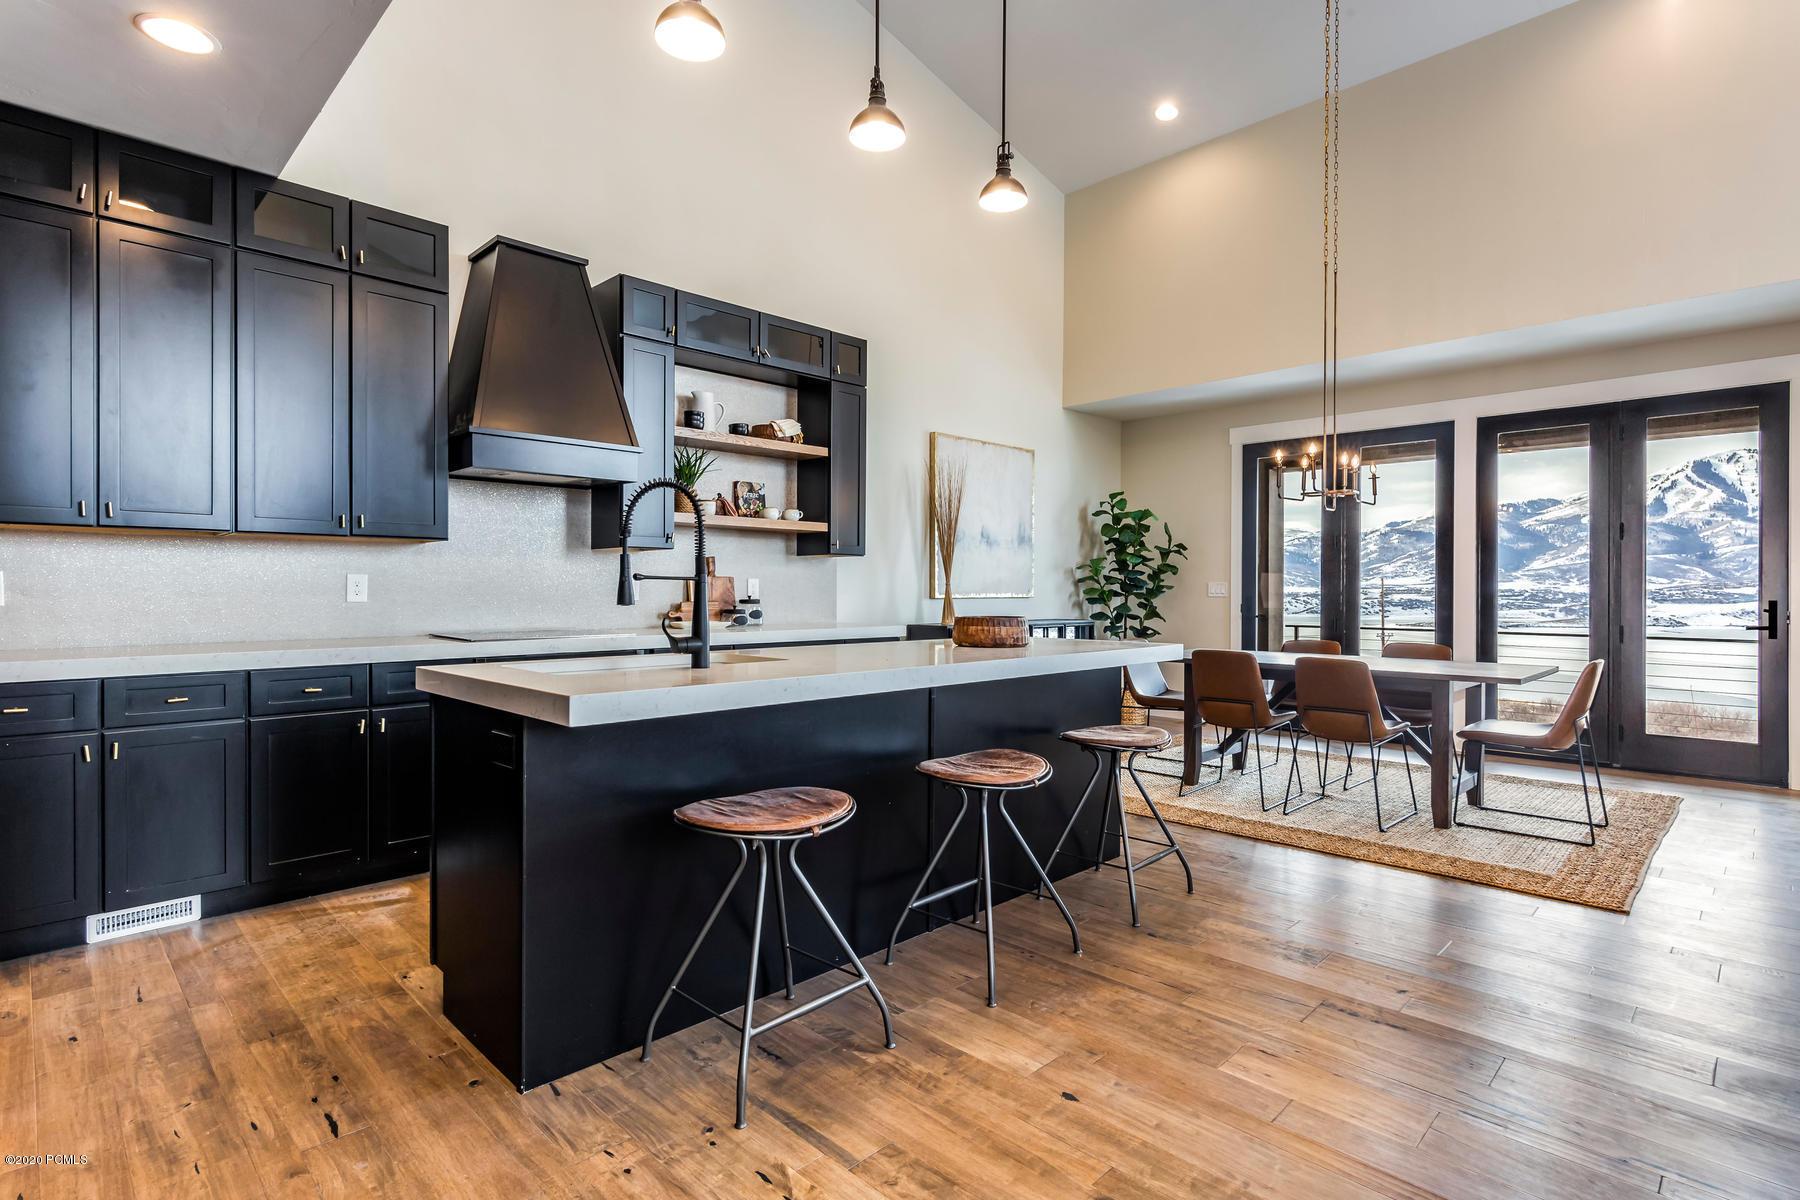 11889 Shoreline Dr, Lot 15, Hideout, Utah 84036, 4 Bedrooms Bedrooms, ,4 BathroomsBathrooms,Condominium,For Sale,Shoreline Dr, Lot 15,20190109112430415765000000